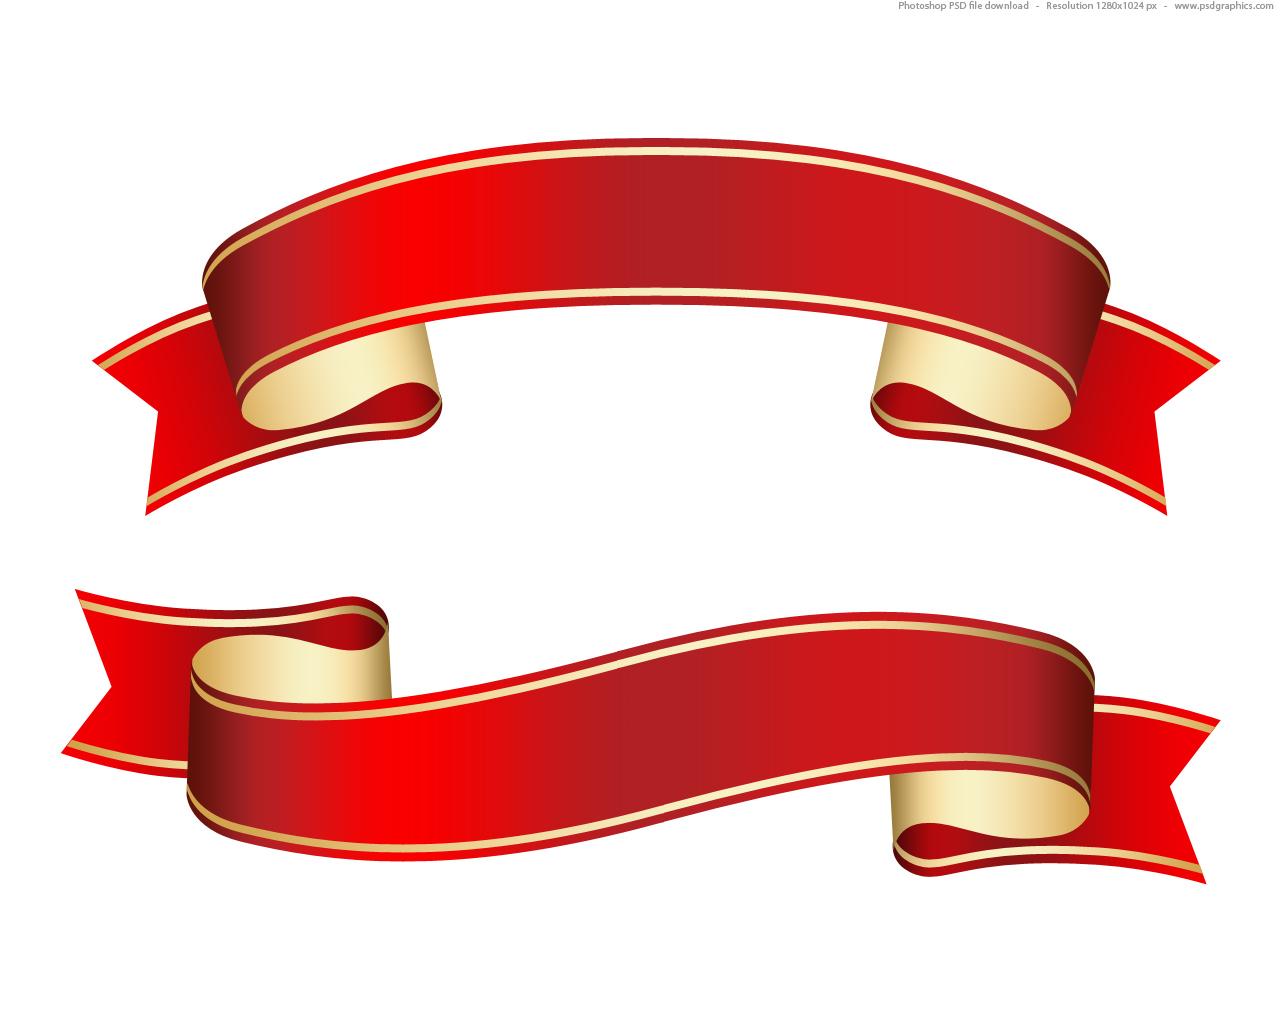 Ribbon HD wallpapers, Desktop wallpaper - most viewed